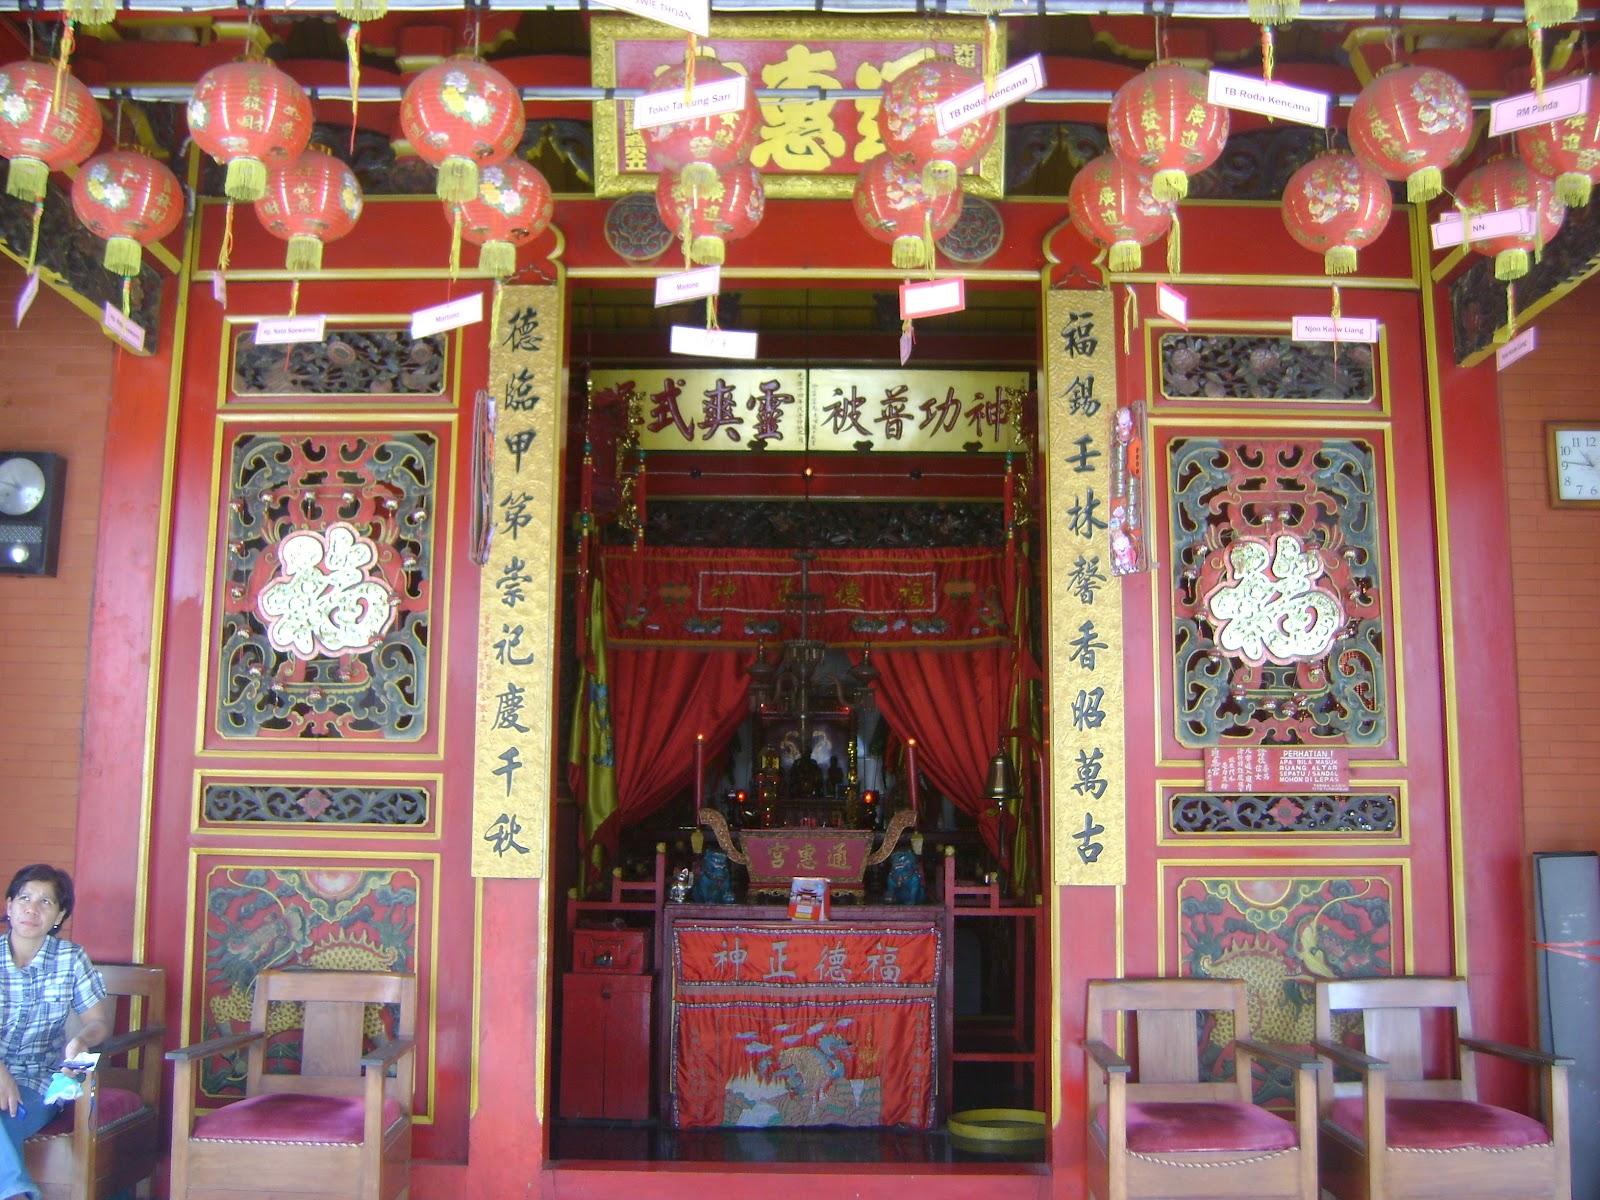 Klenteng Thong Hwie Kiong Kekunaan Ciri Standar Bawah Bangunan Batunya